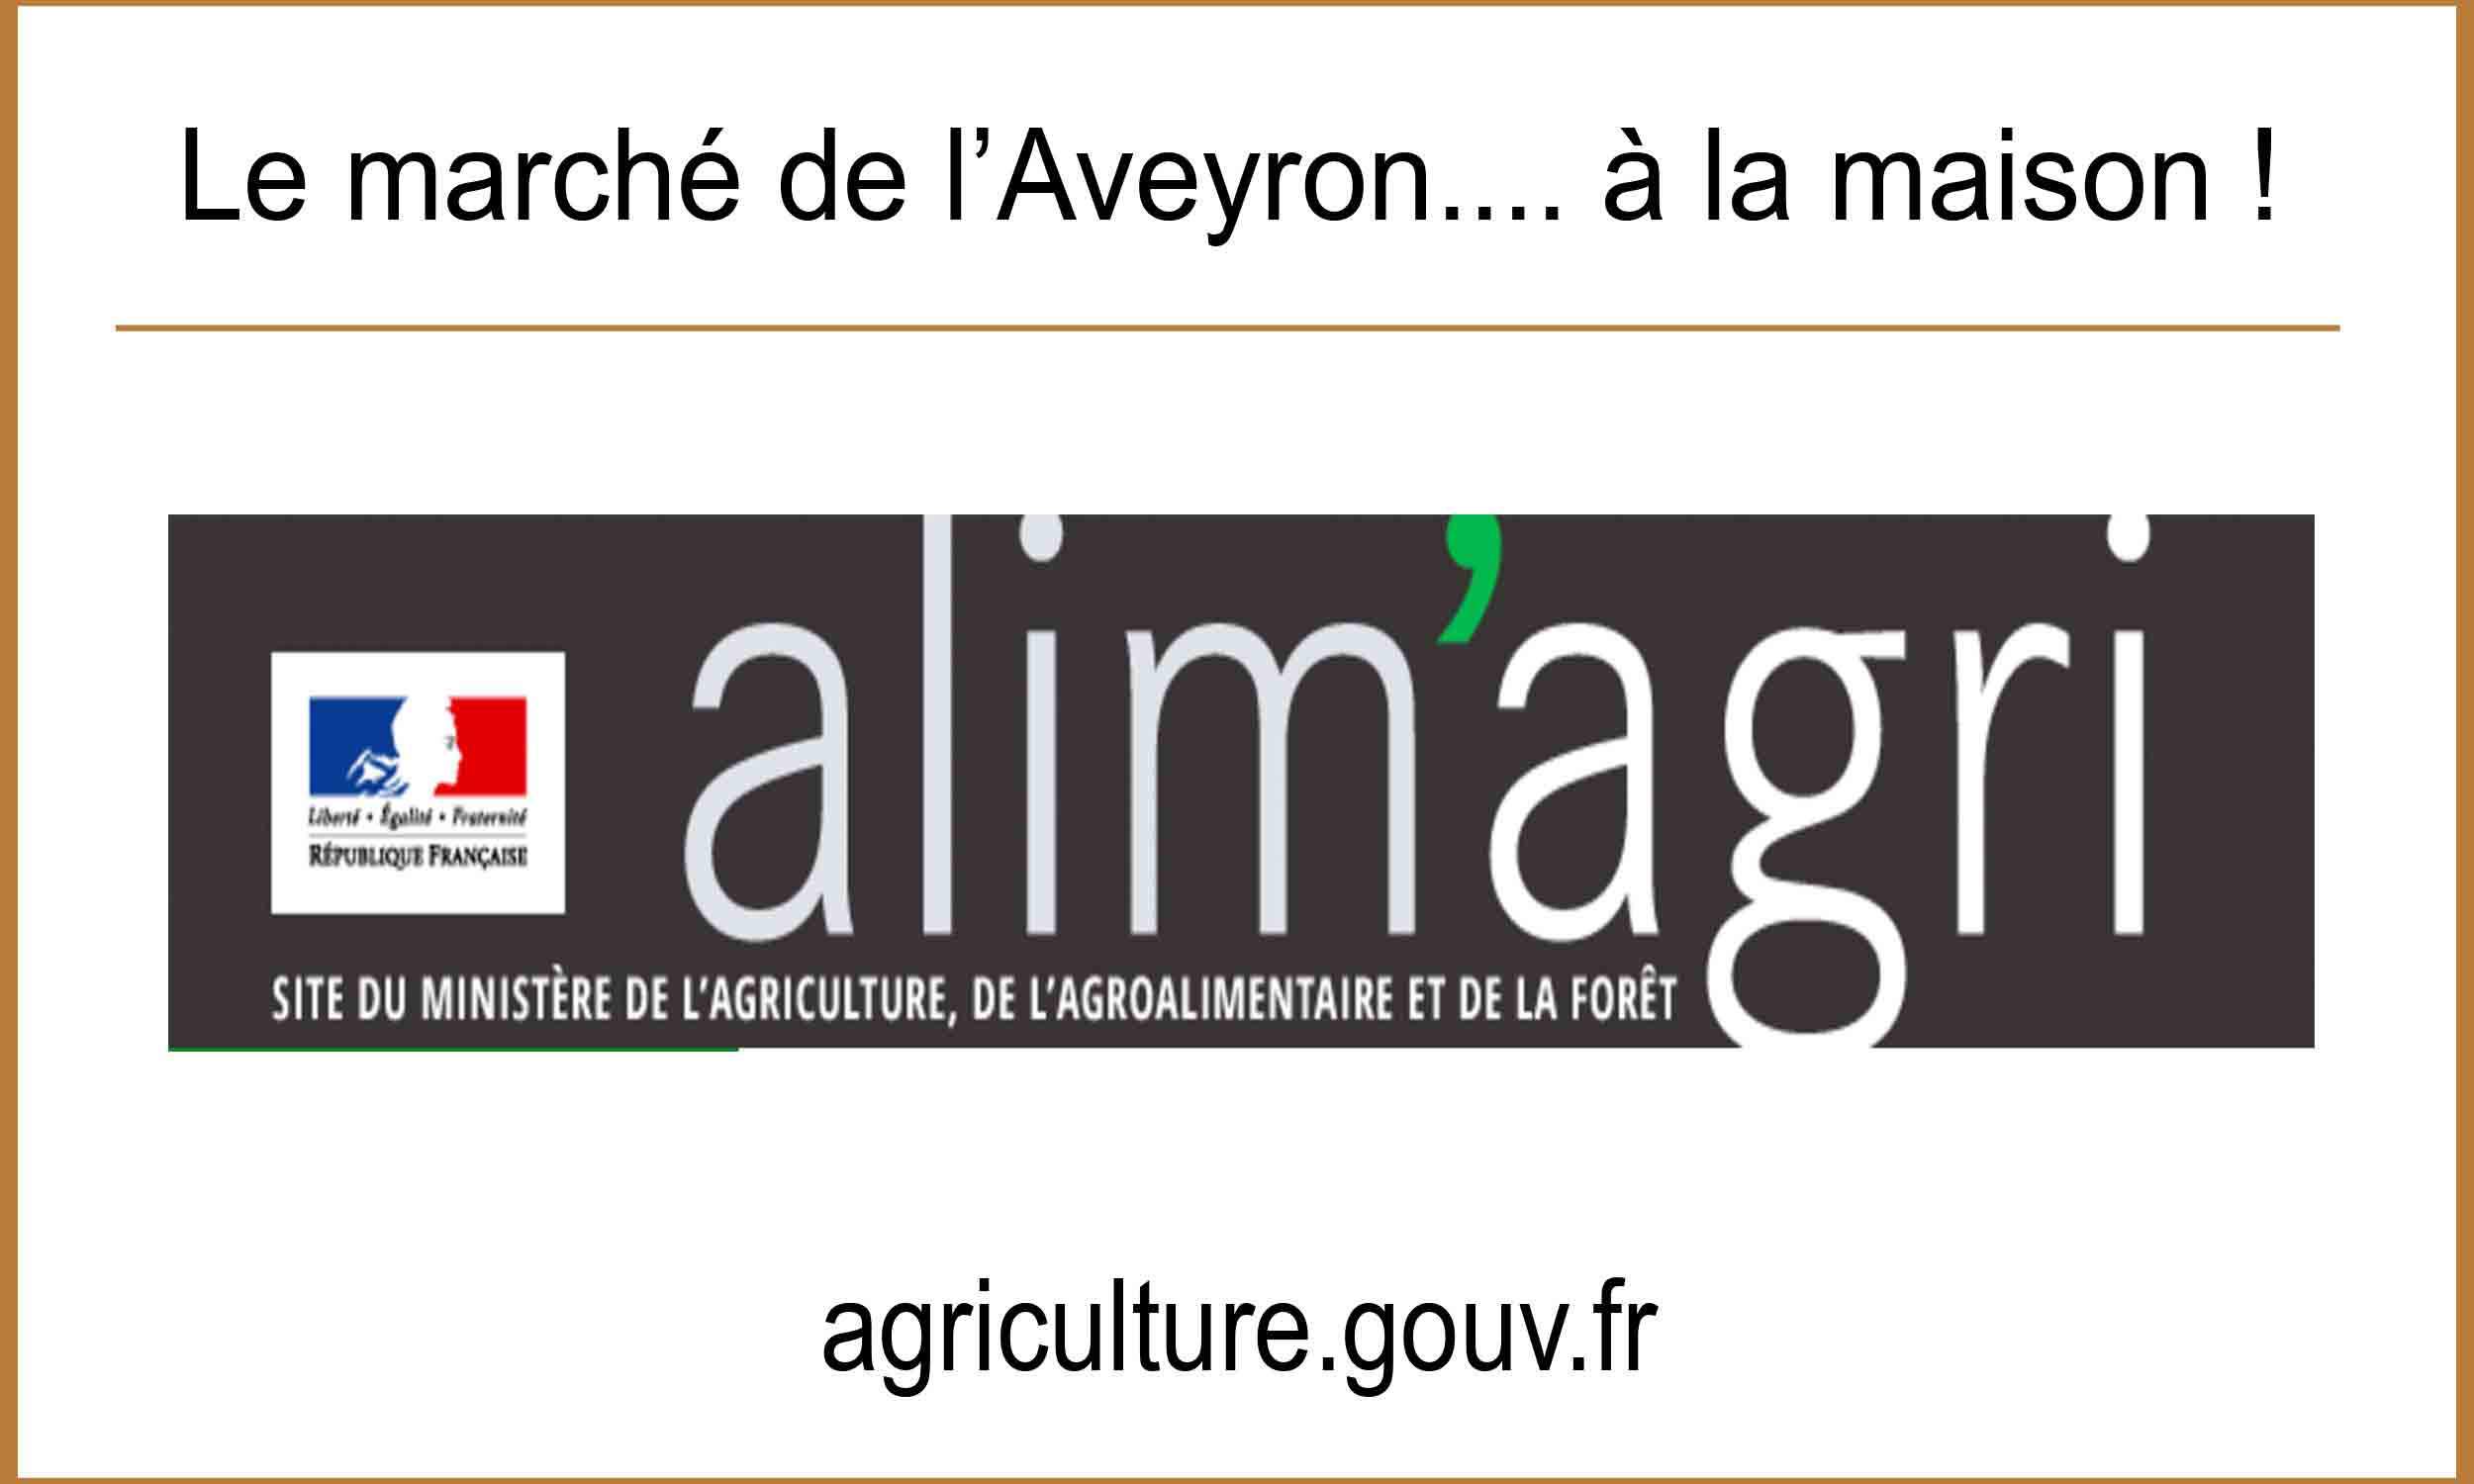 Agriculture gouv